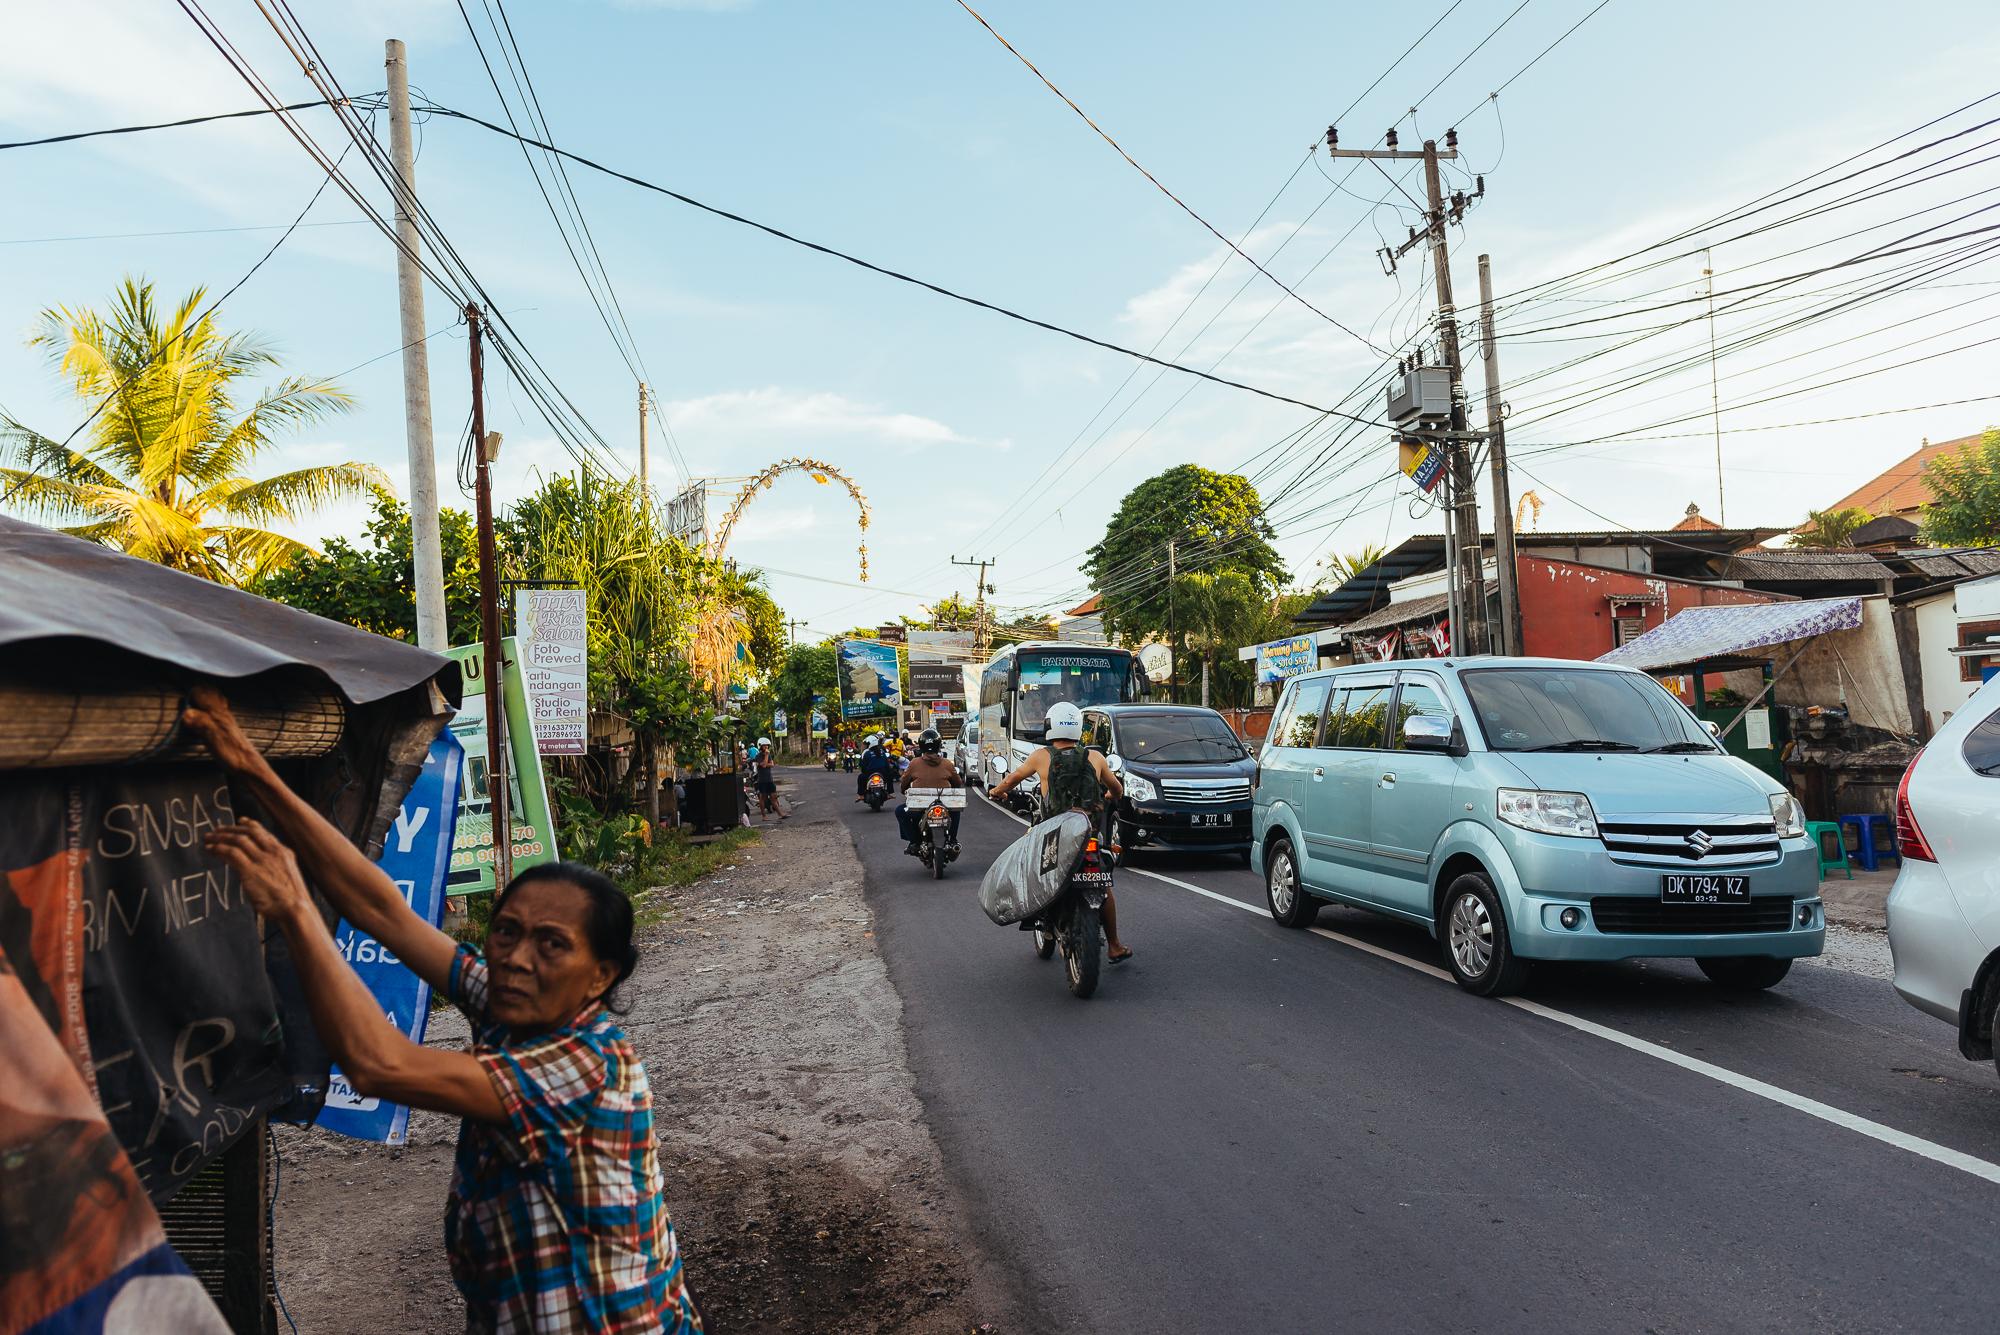 indonesia_2017-9.jpg